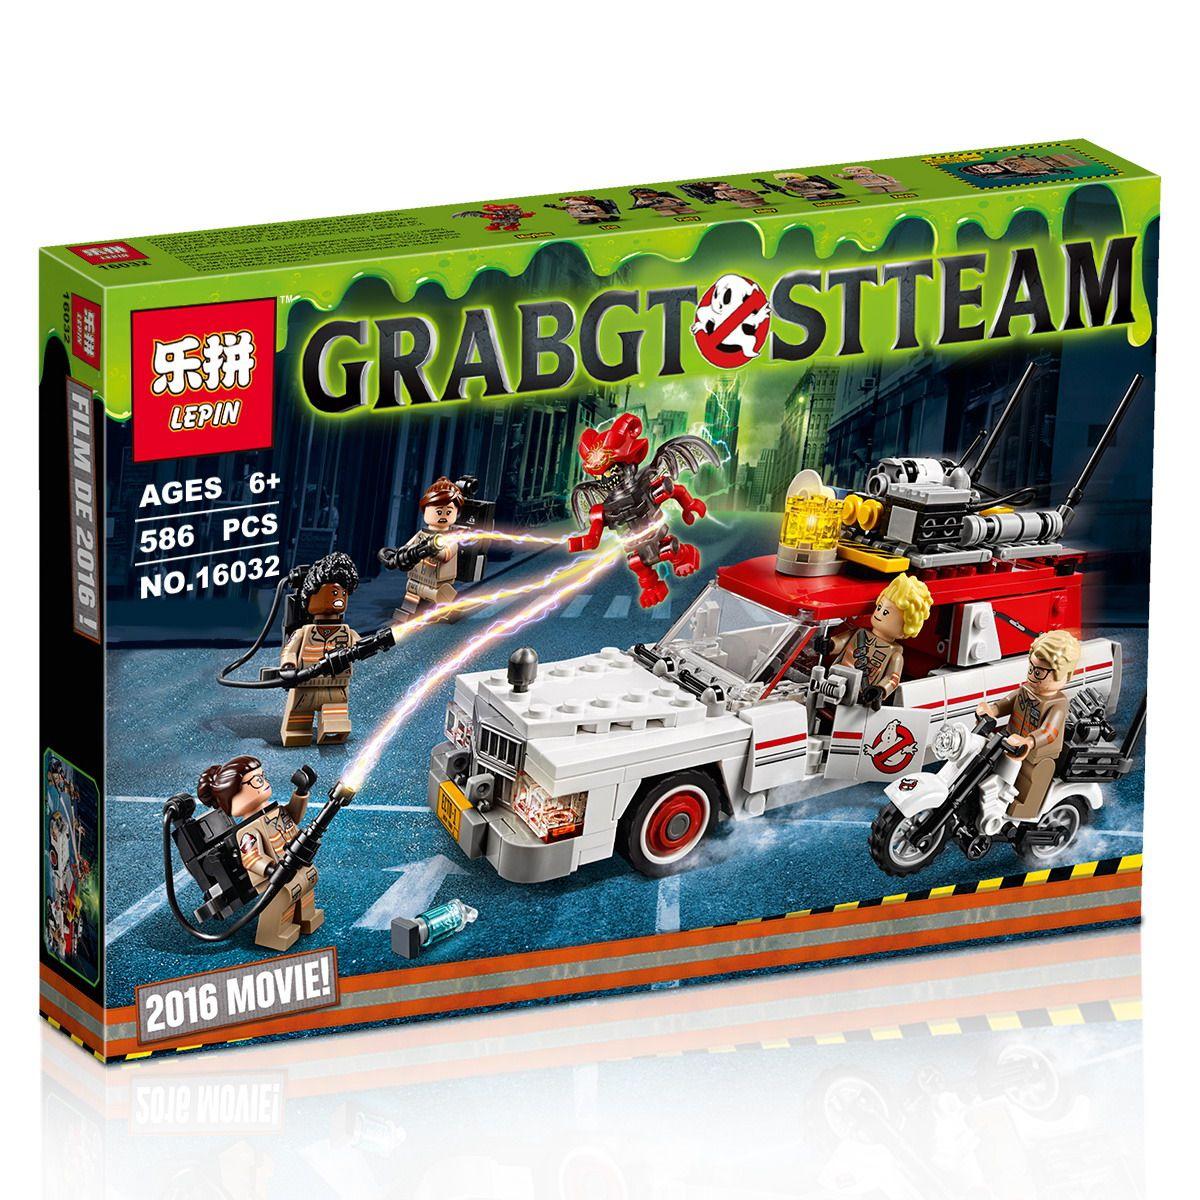 Ghostbusters Ecto-1 /& 2 75828 Building Blocks 586 Pcs Bricks Free Shipping